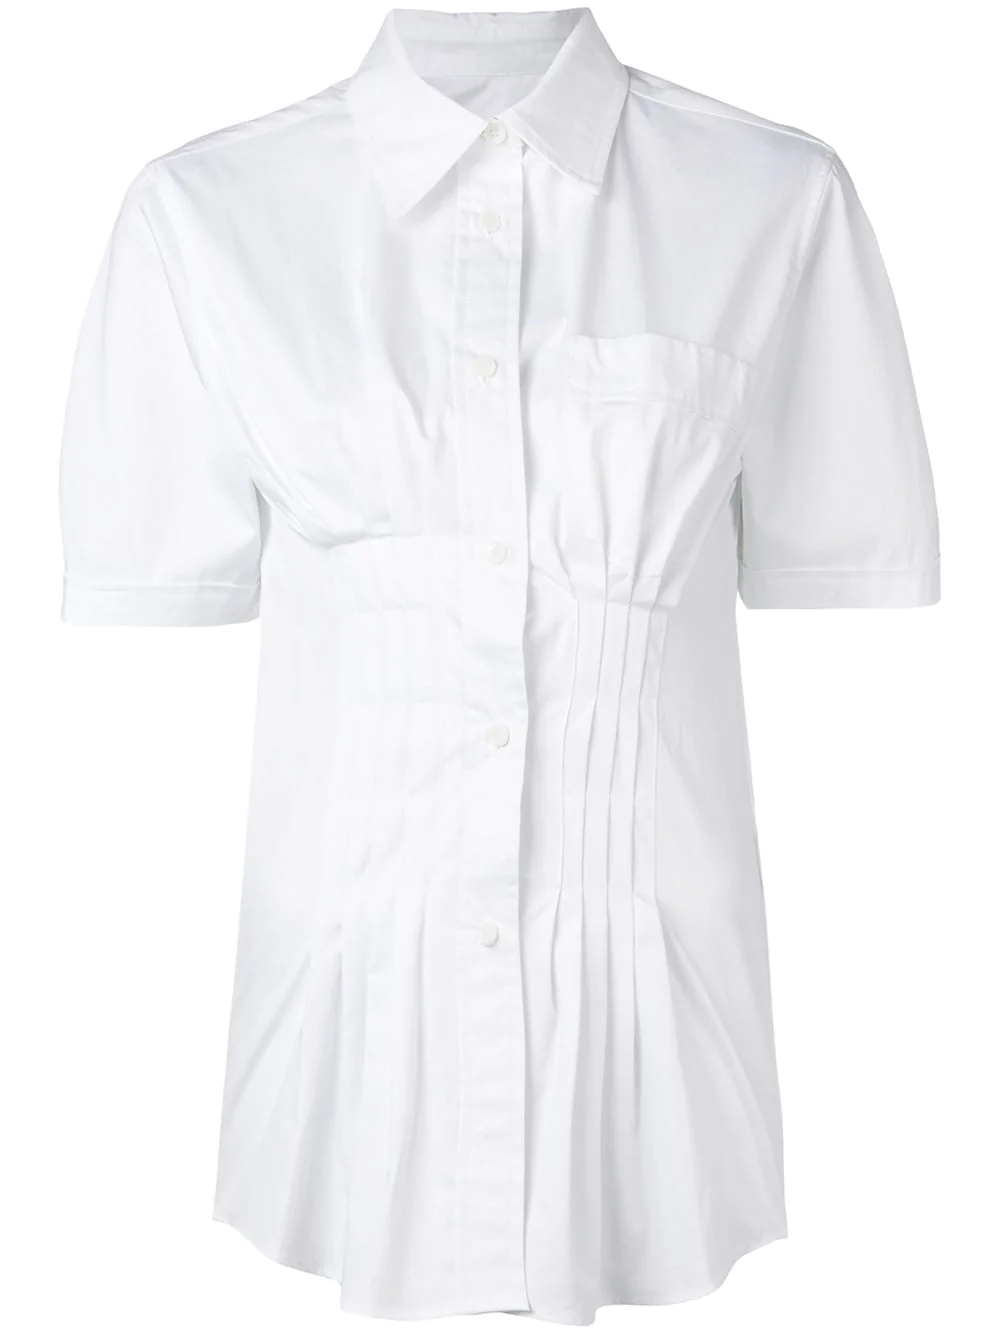 46b1f073246e4 Isabel Marant Gramy Shirt - White. Farfetch